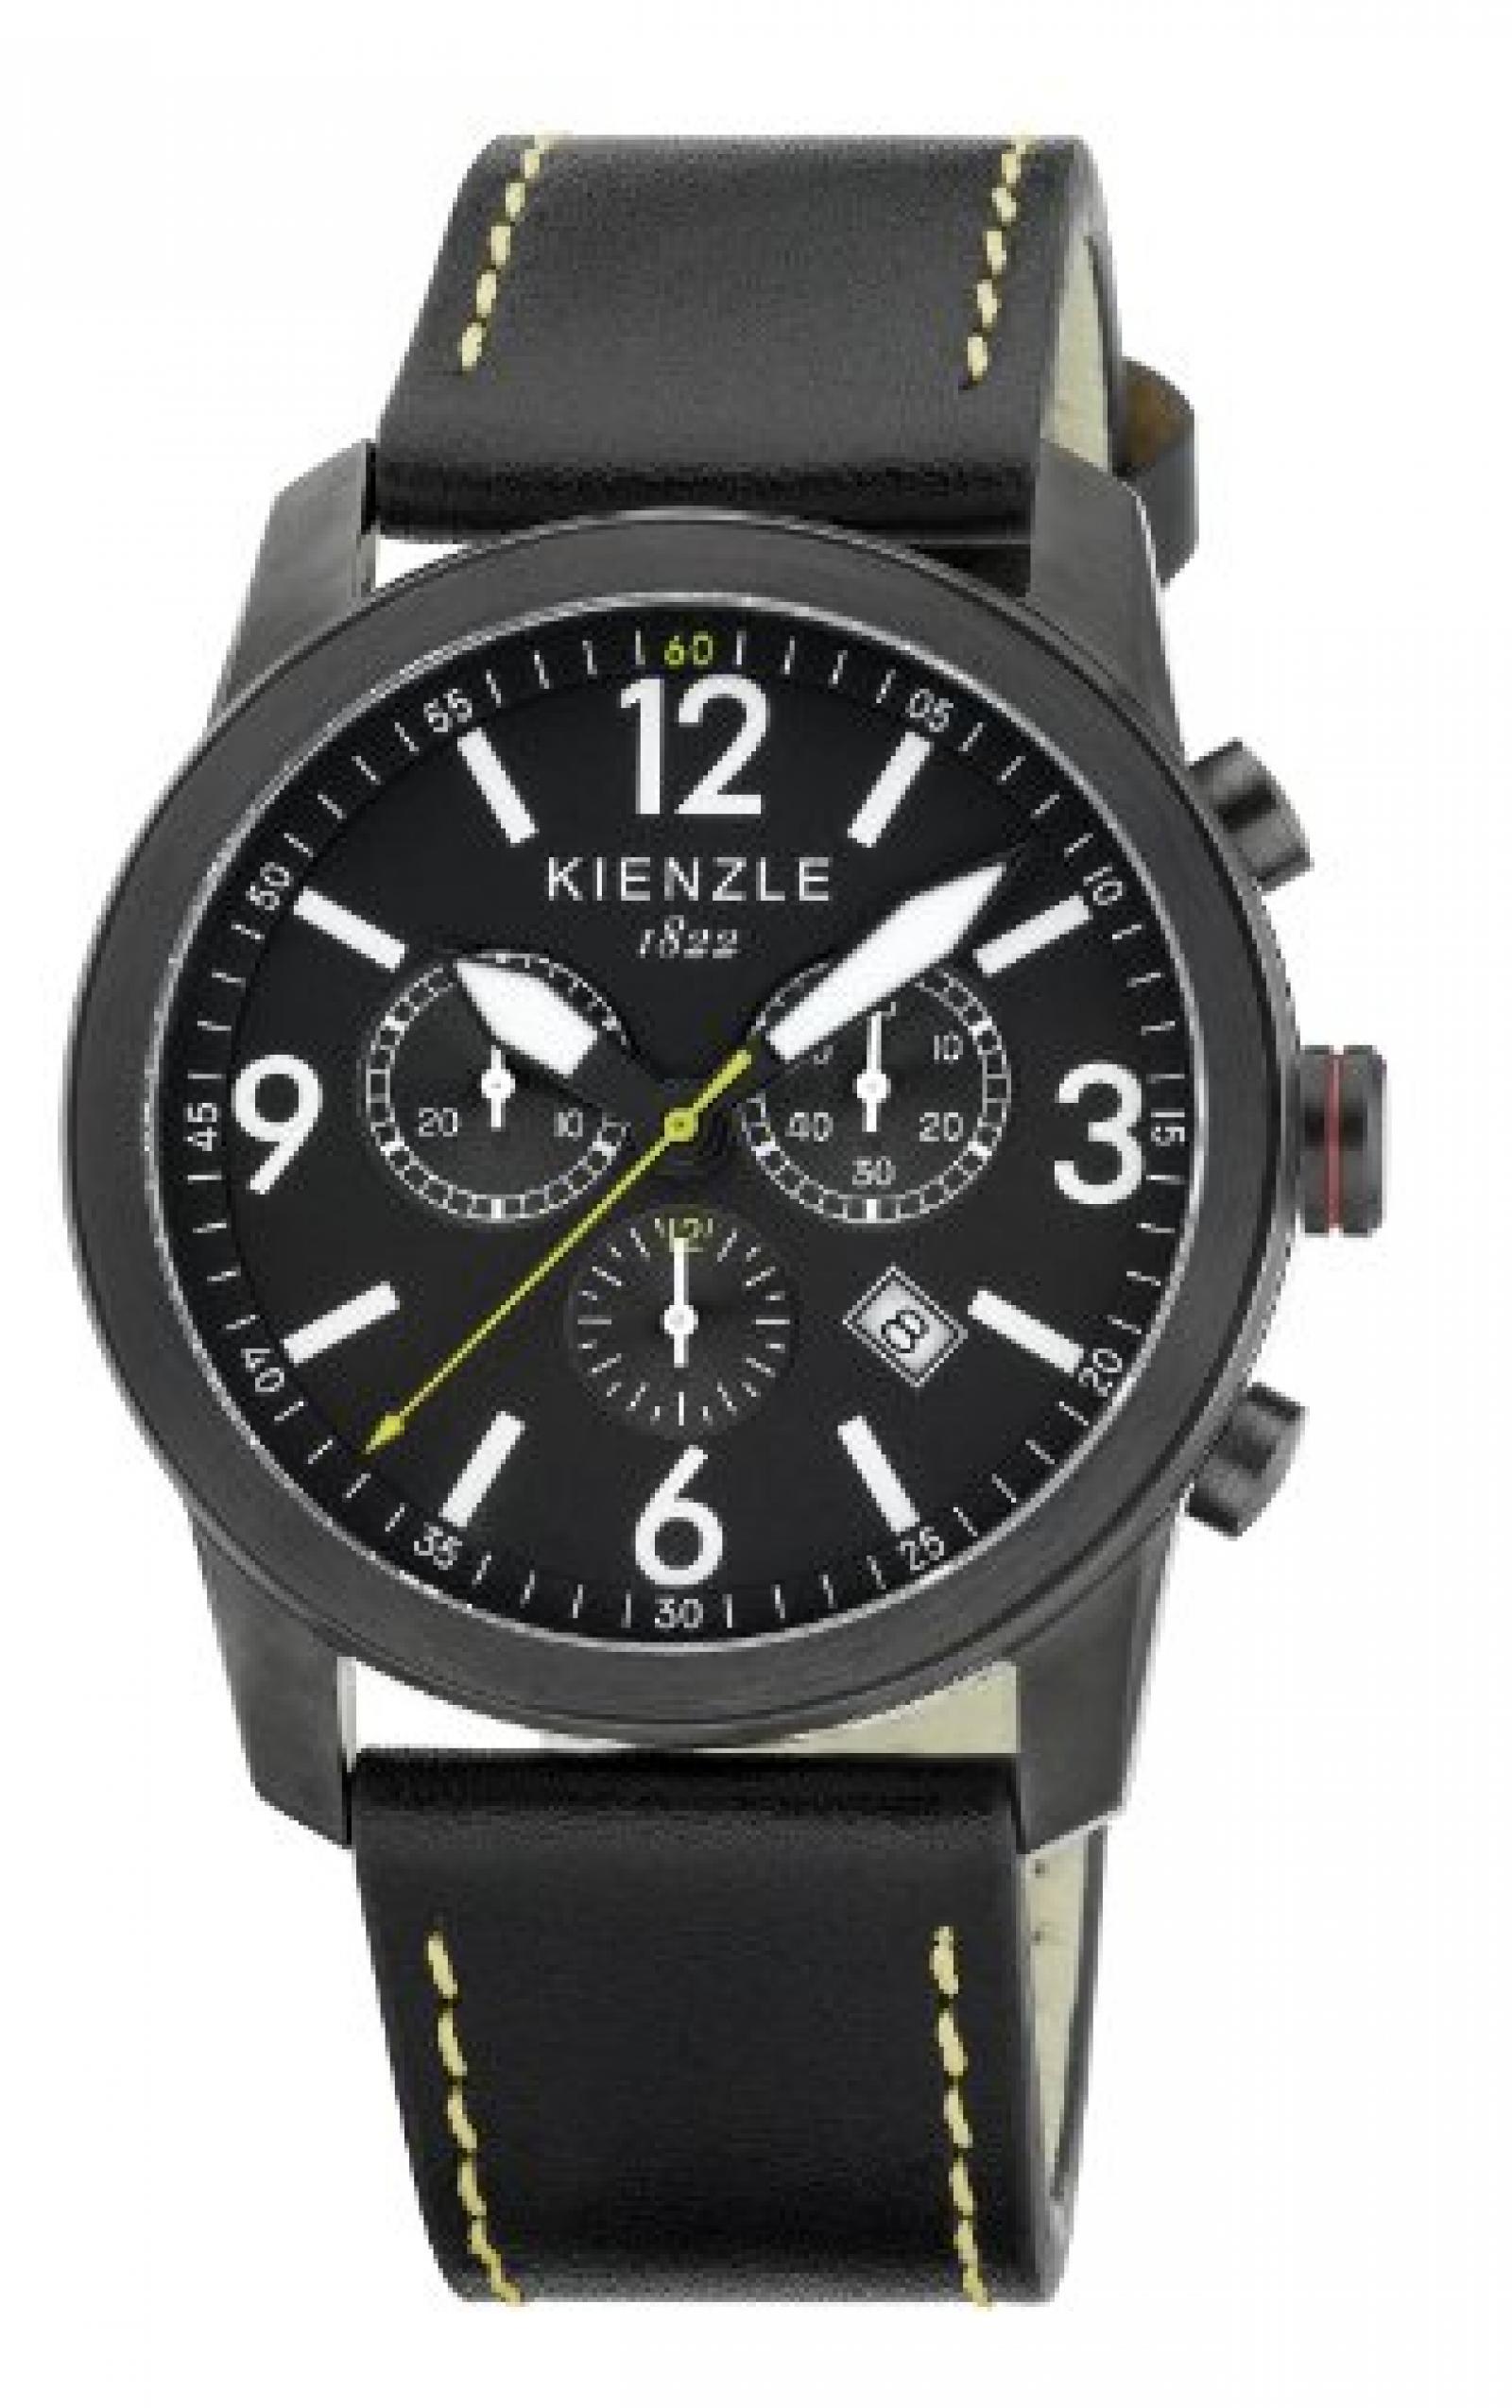 Kienzle Herren-Armbanduhr XL Chronograph KIENZLE CORE Analog Quarz Leder K3091043031-00321